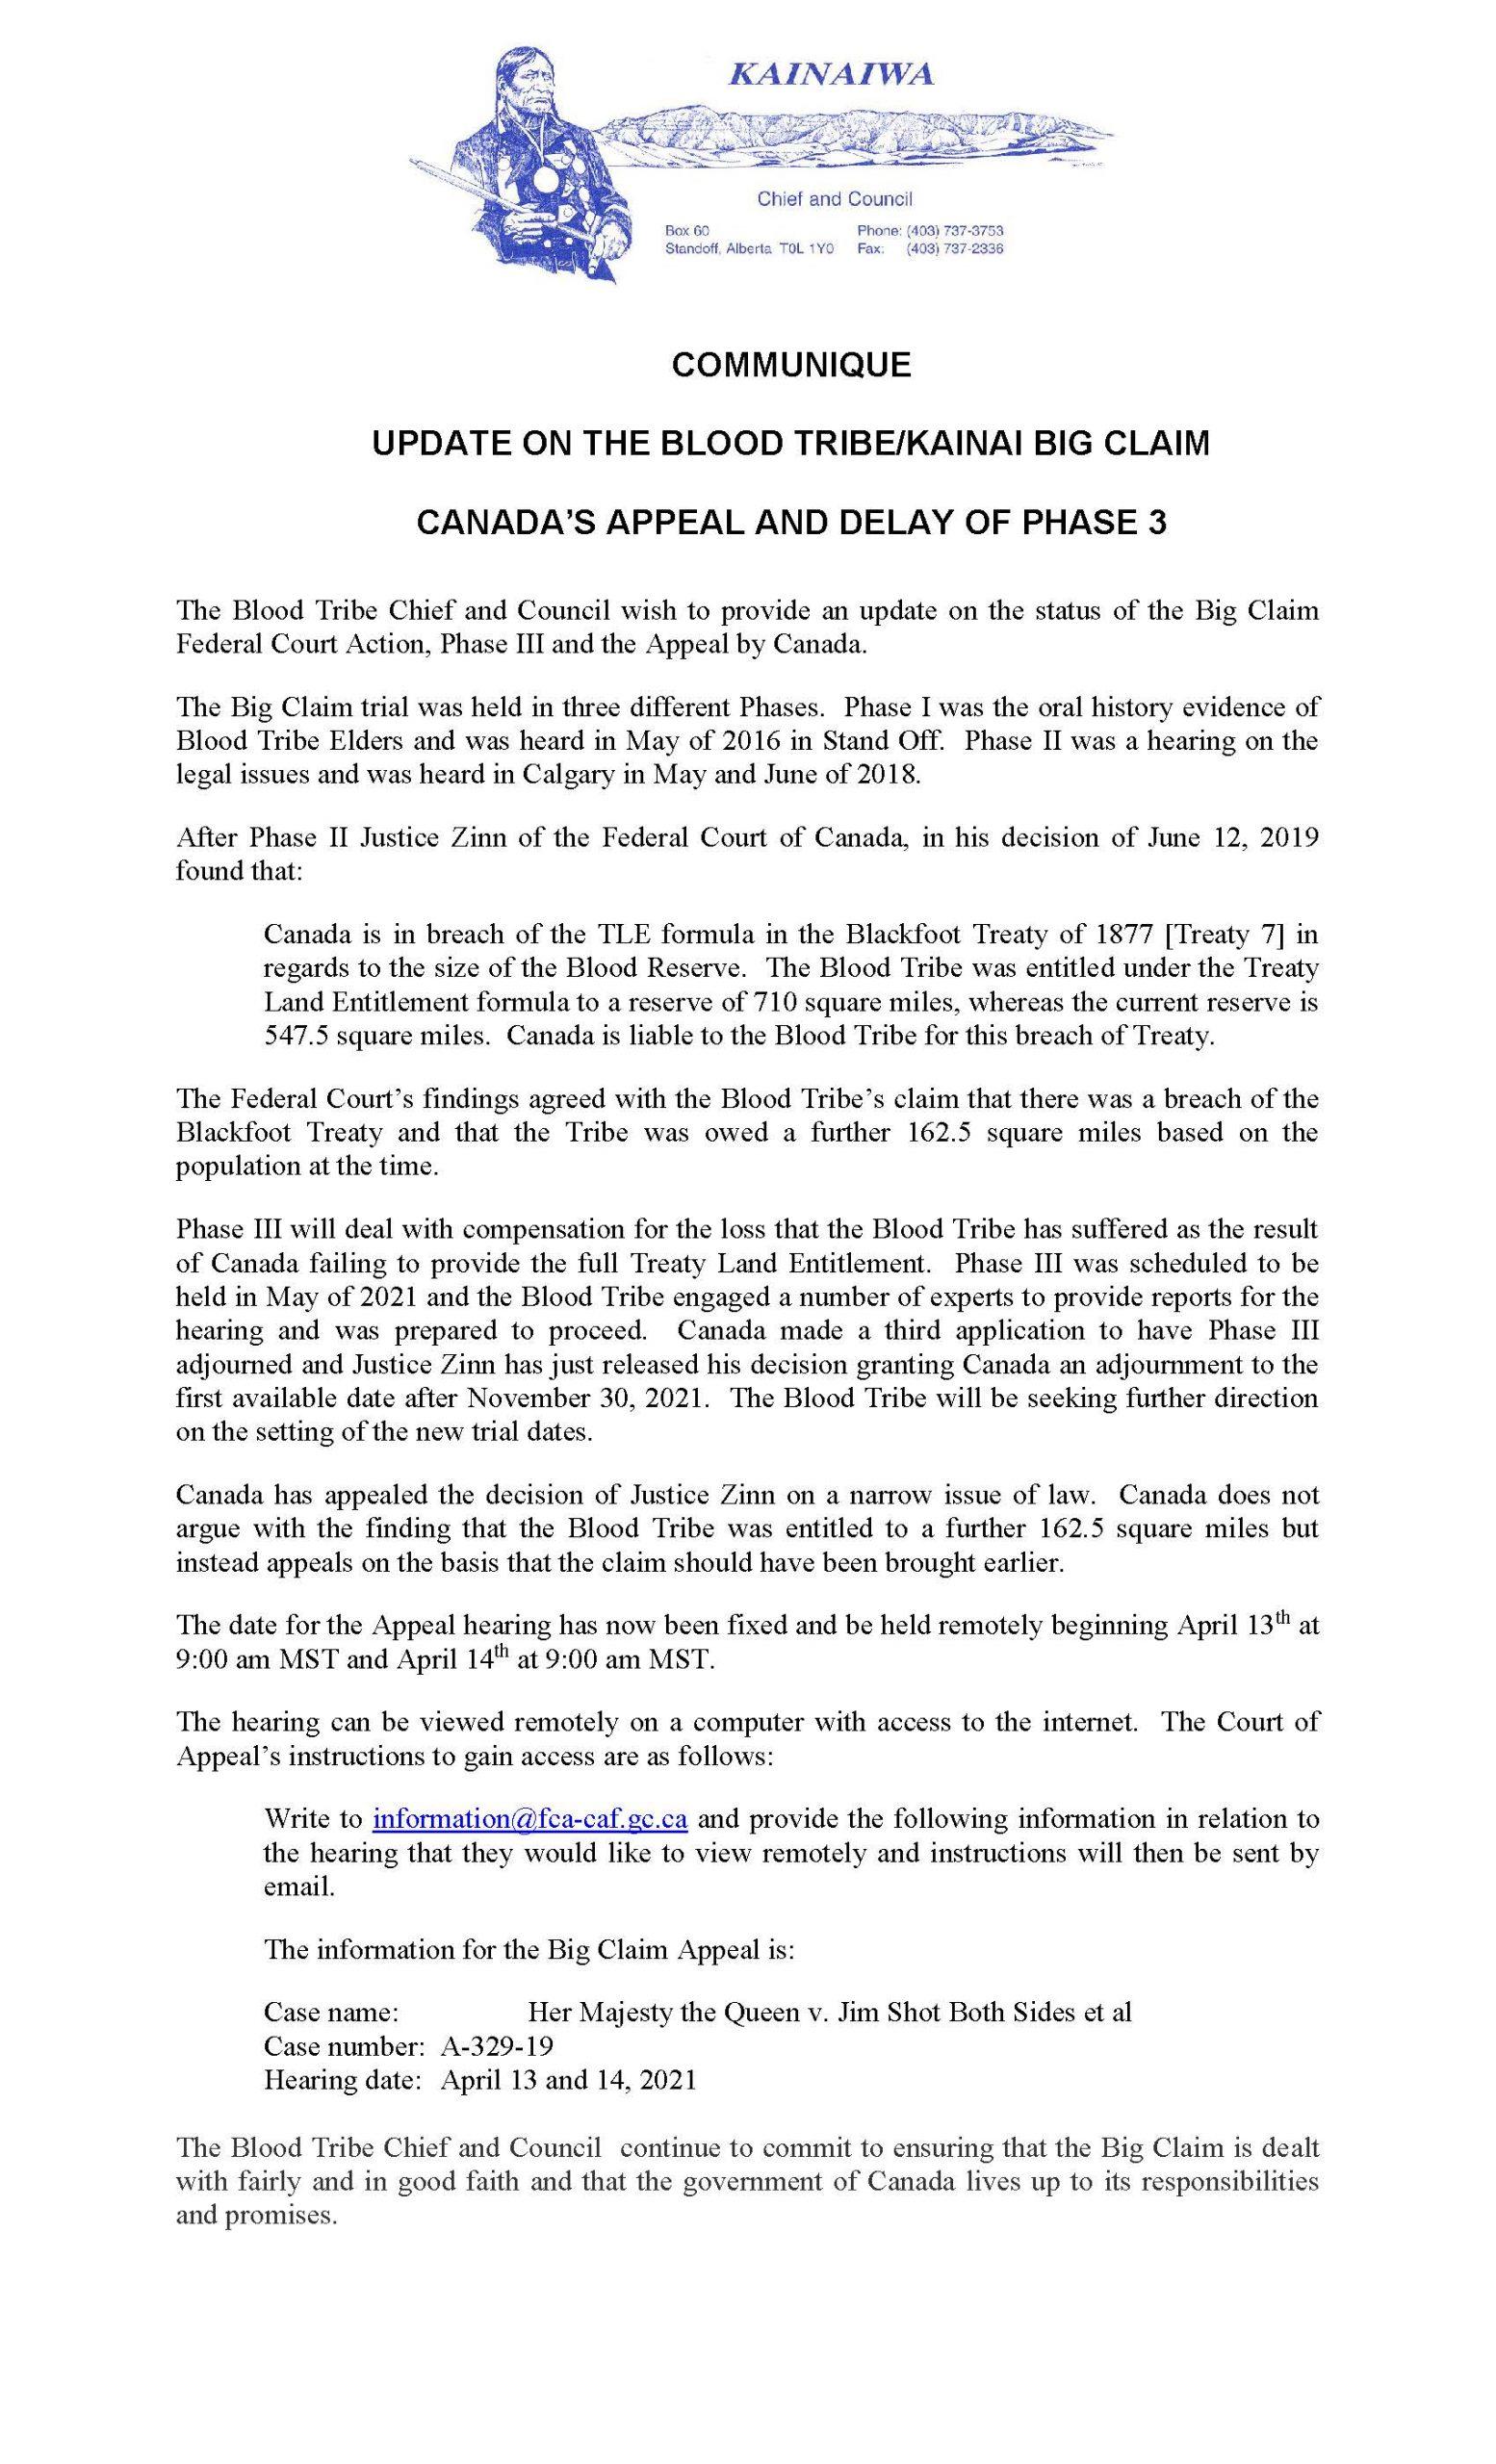 Update on the Blood Tribe/Kainai Big Claim